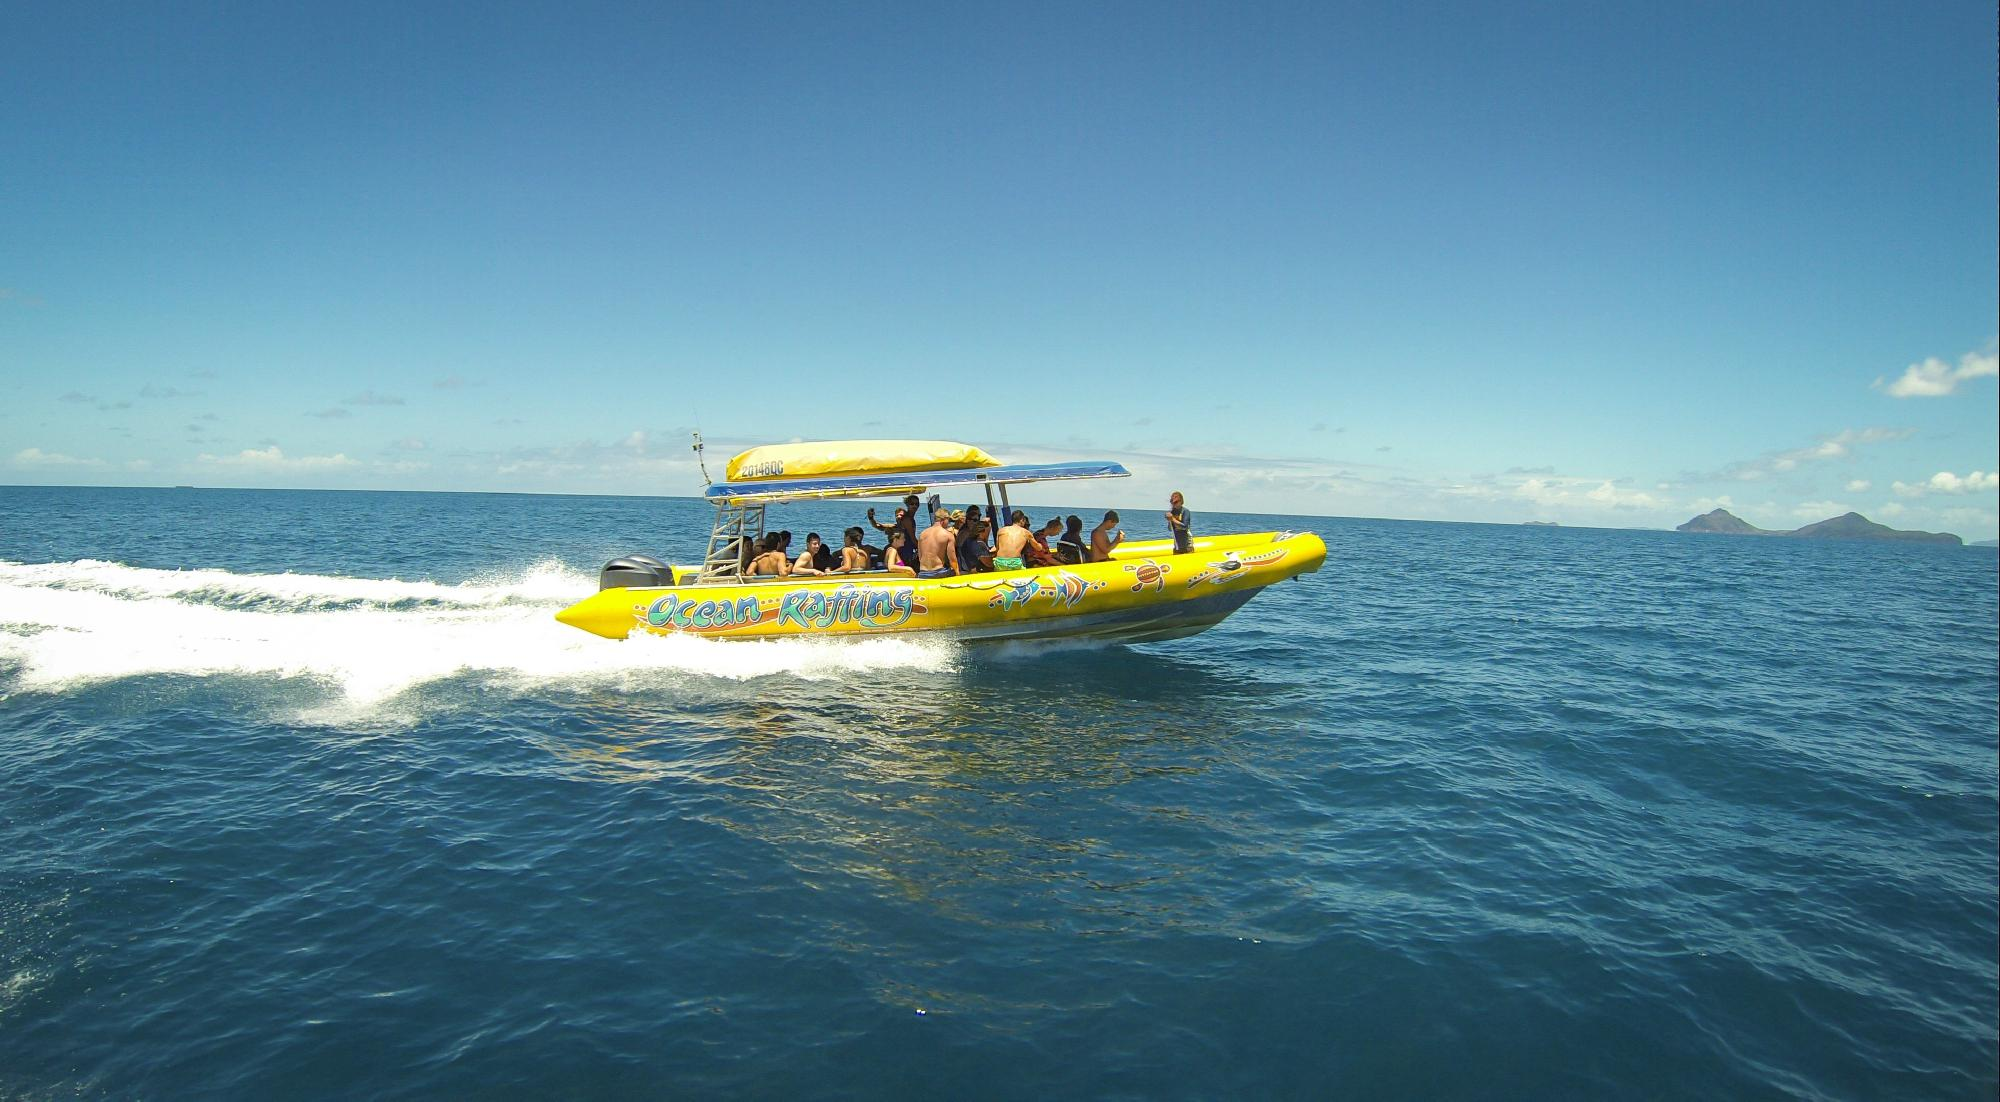 2b. Ocean rafting at Airlie Beach